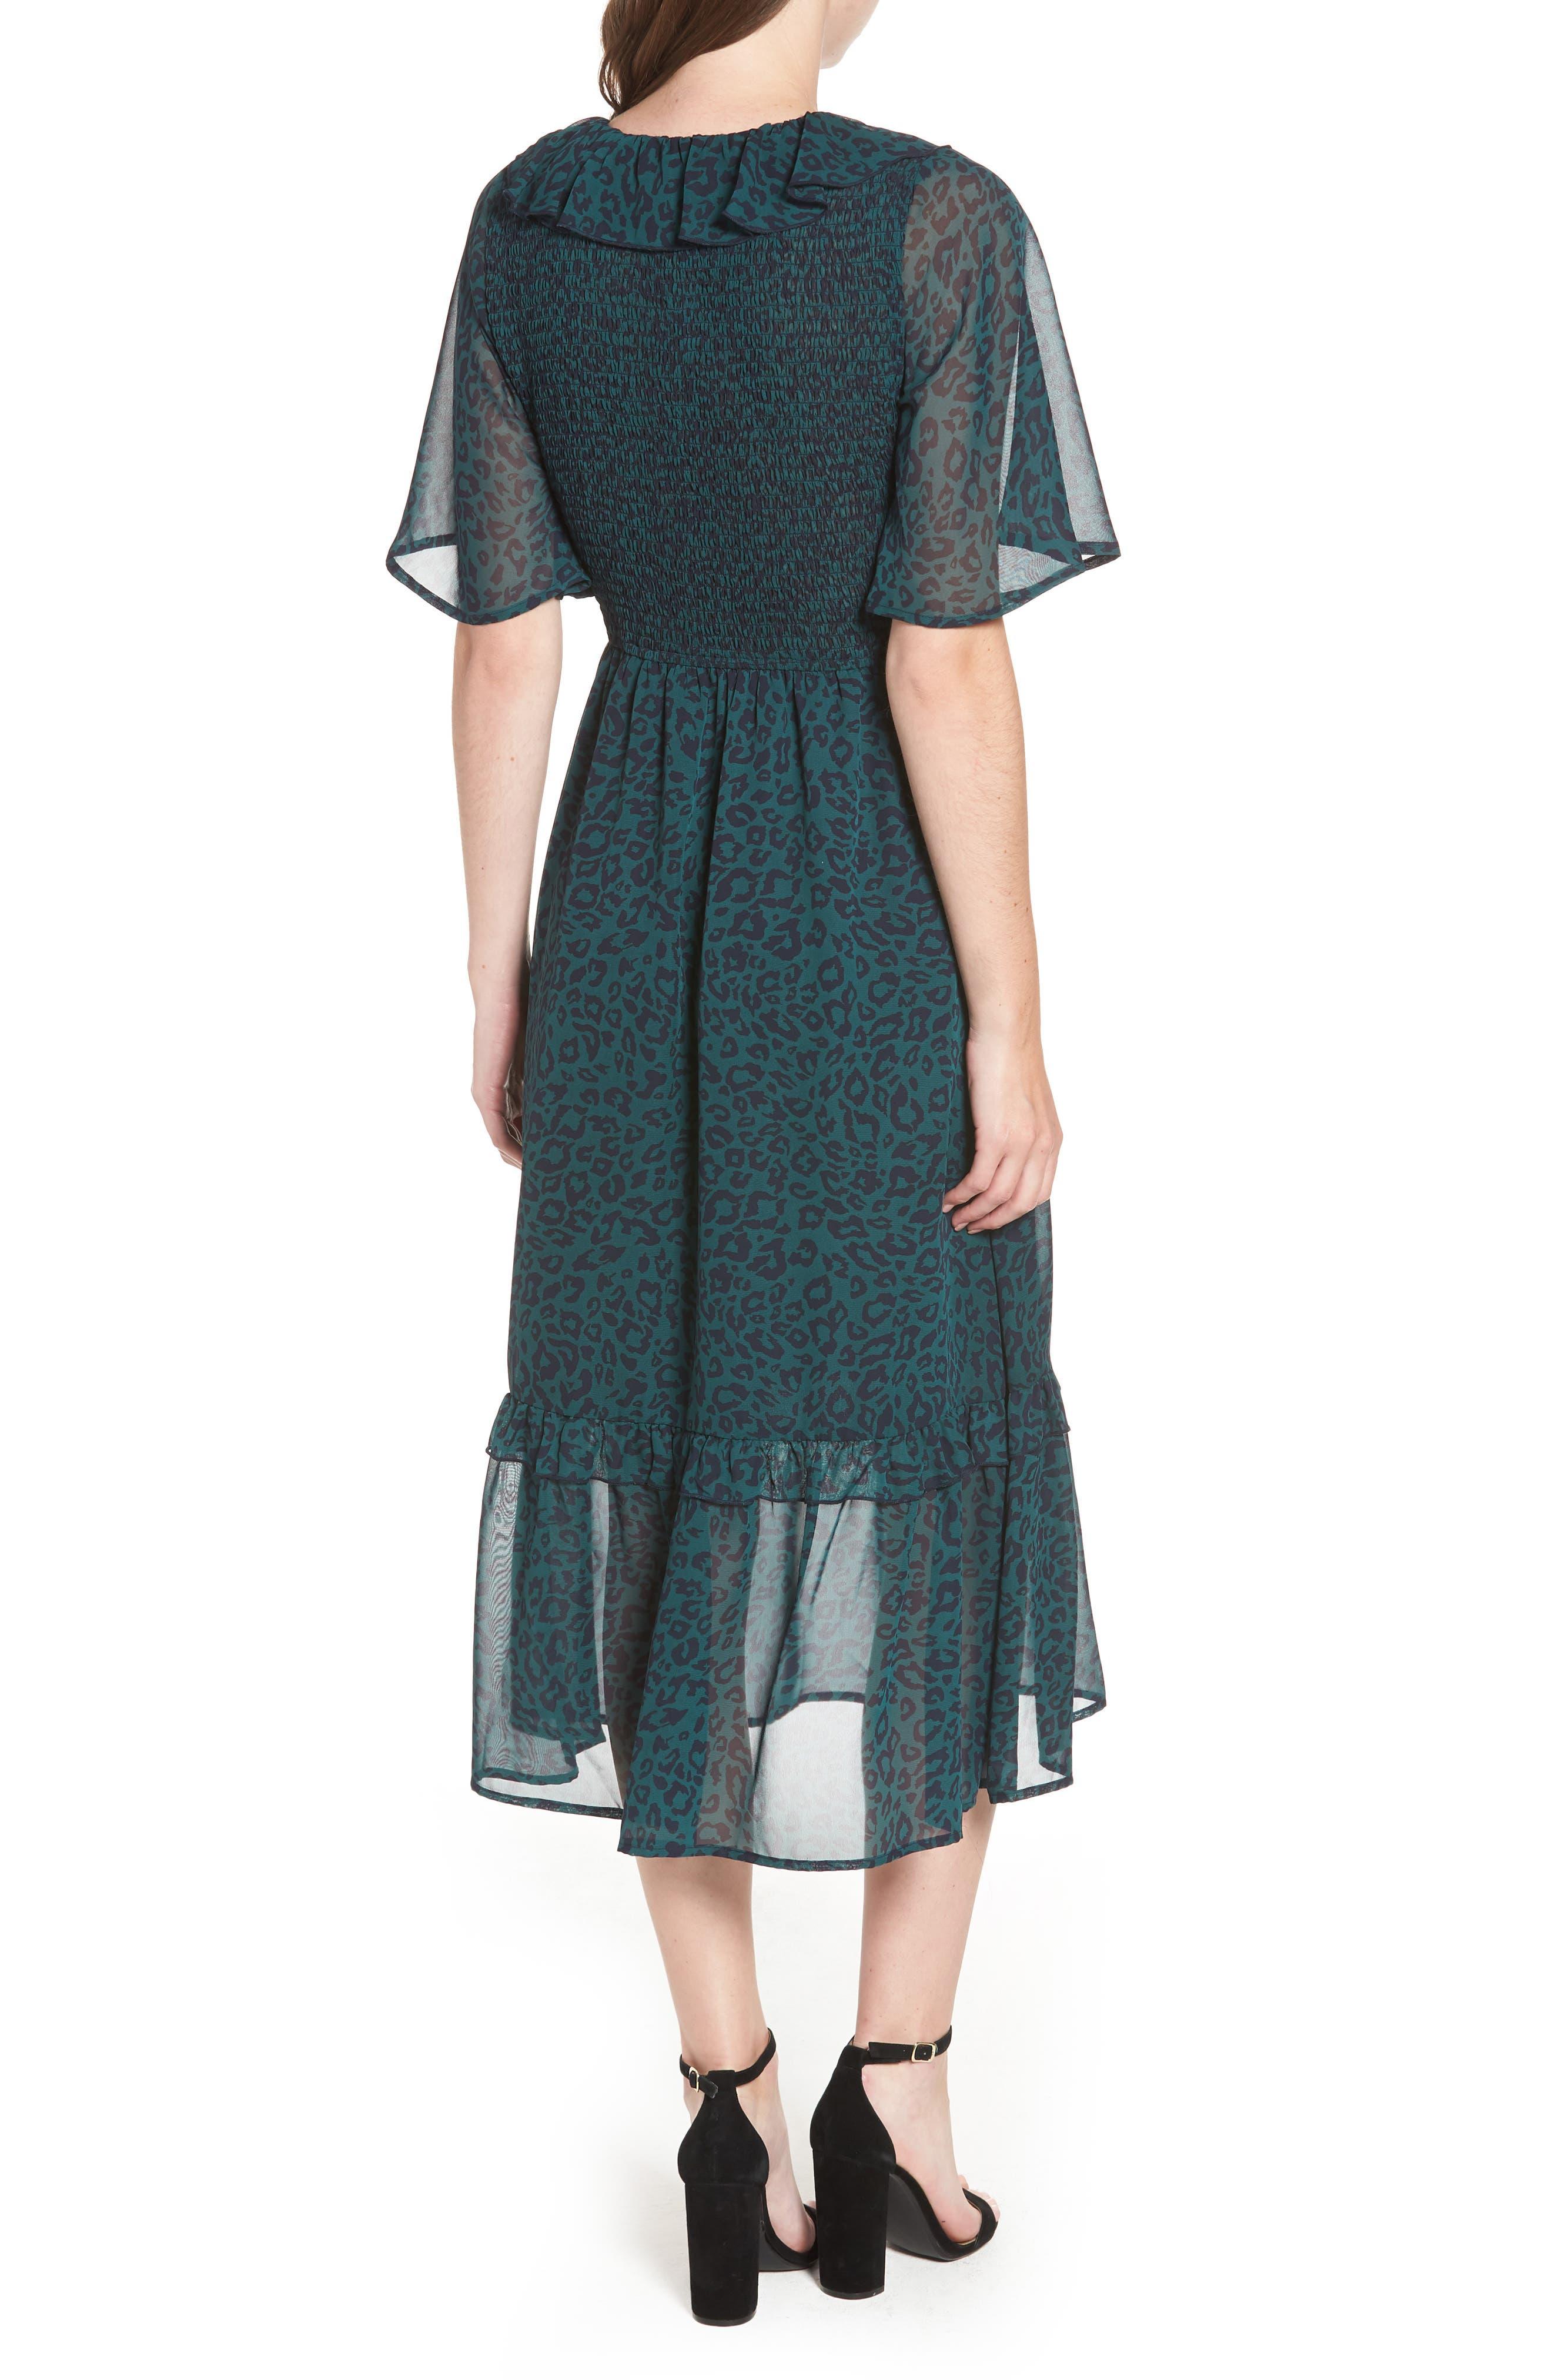 Leopard Print Smocked Dress,                             Alternate thumbnail 2, color,                             GREEN LEOPARD